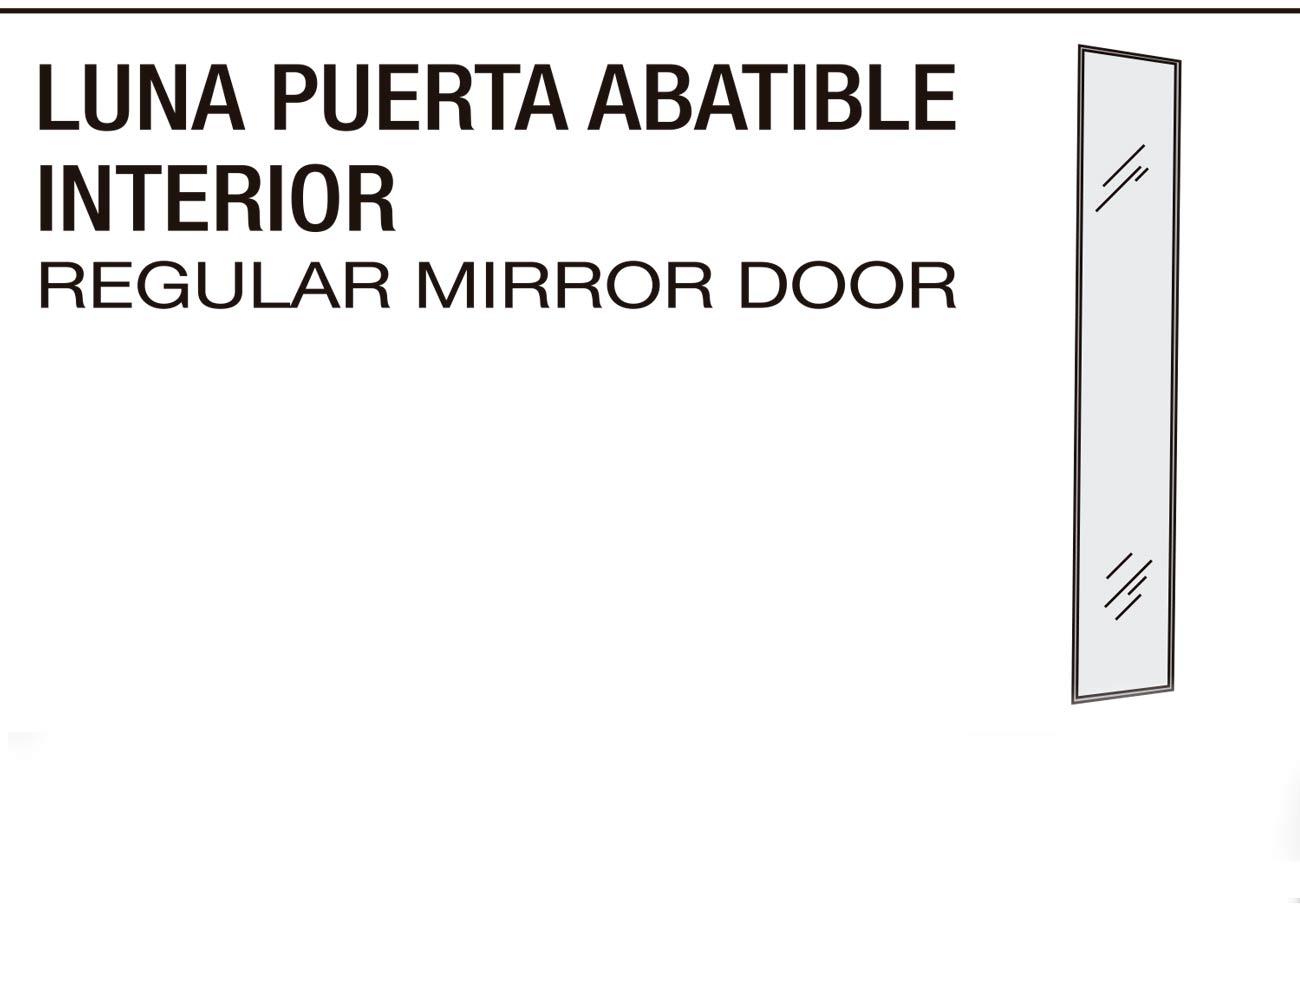 Luna puerta abatible interior